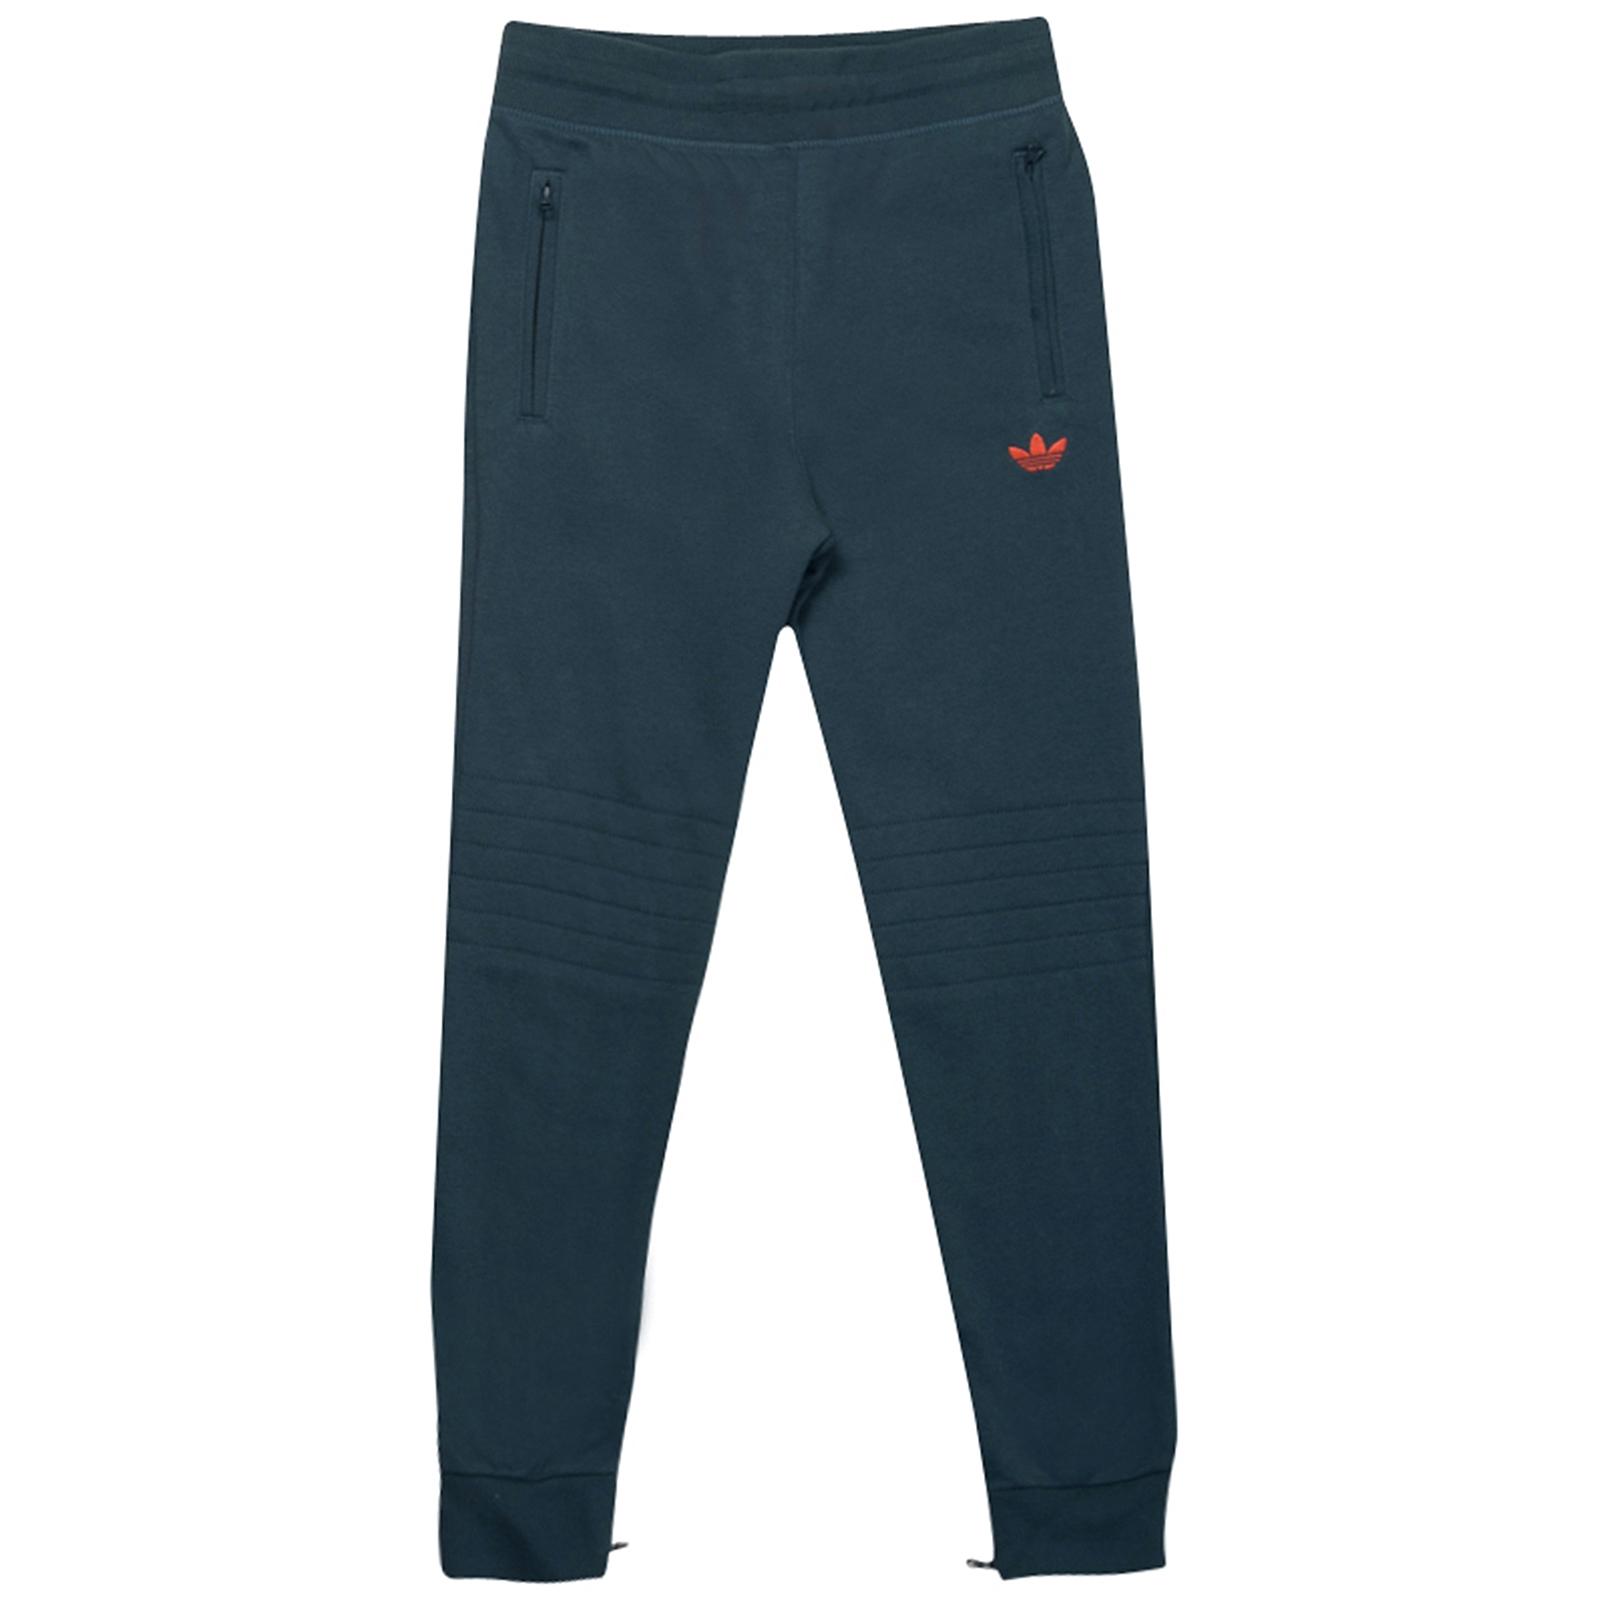 adidas-Originals-Boys-Junior-Fleece-Tracksuit-Track-Pants-Bottoms-B-Grade